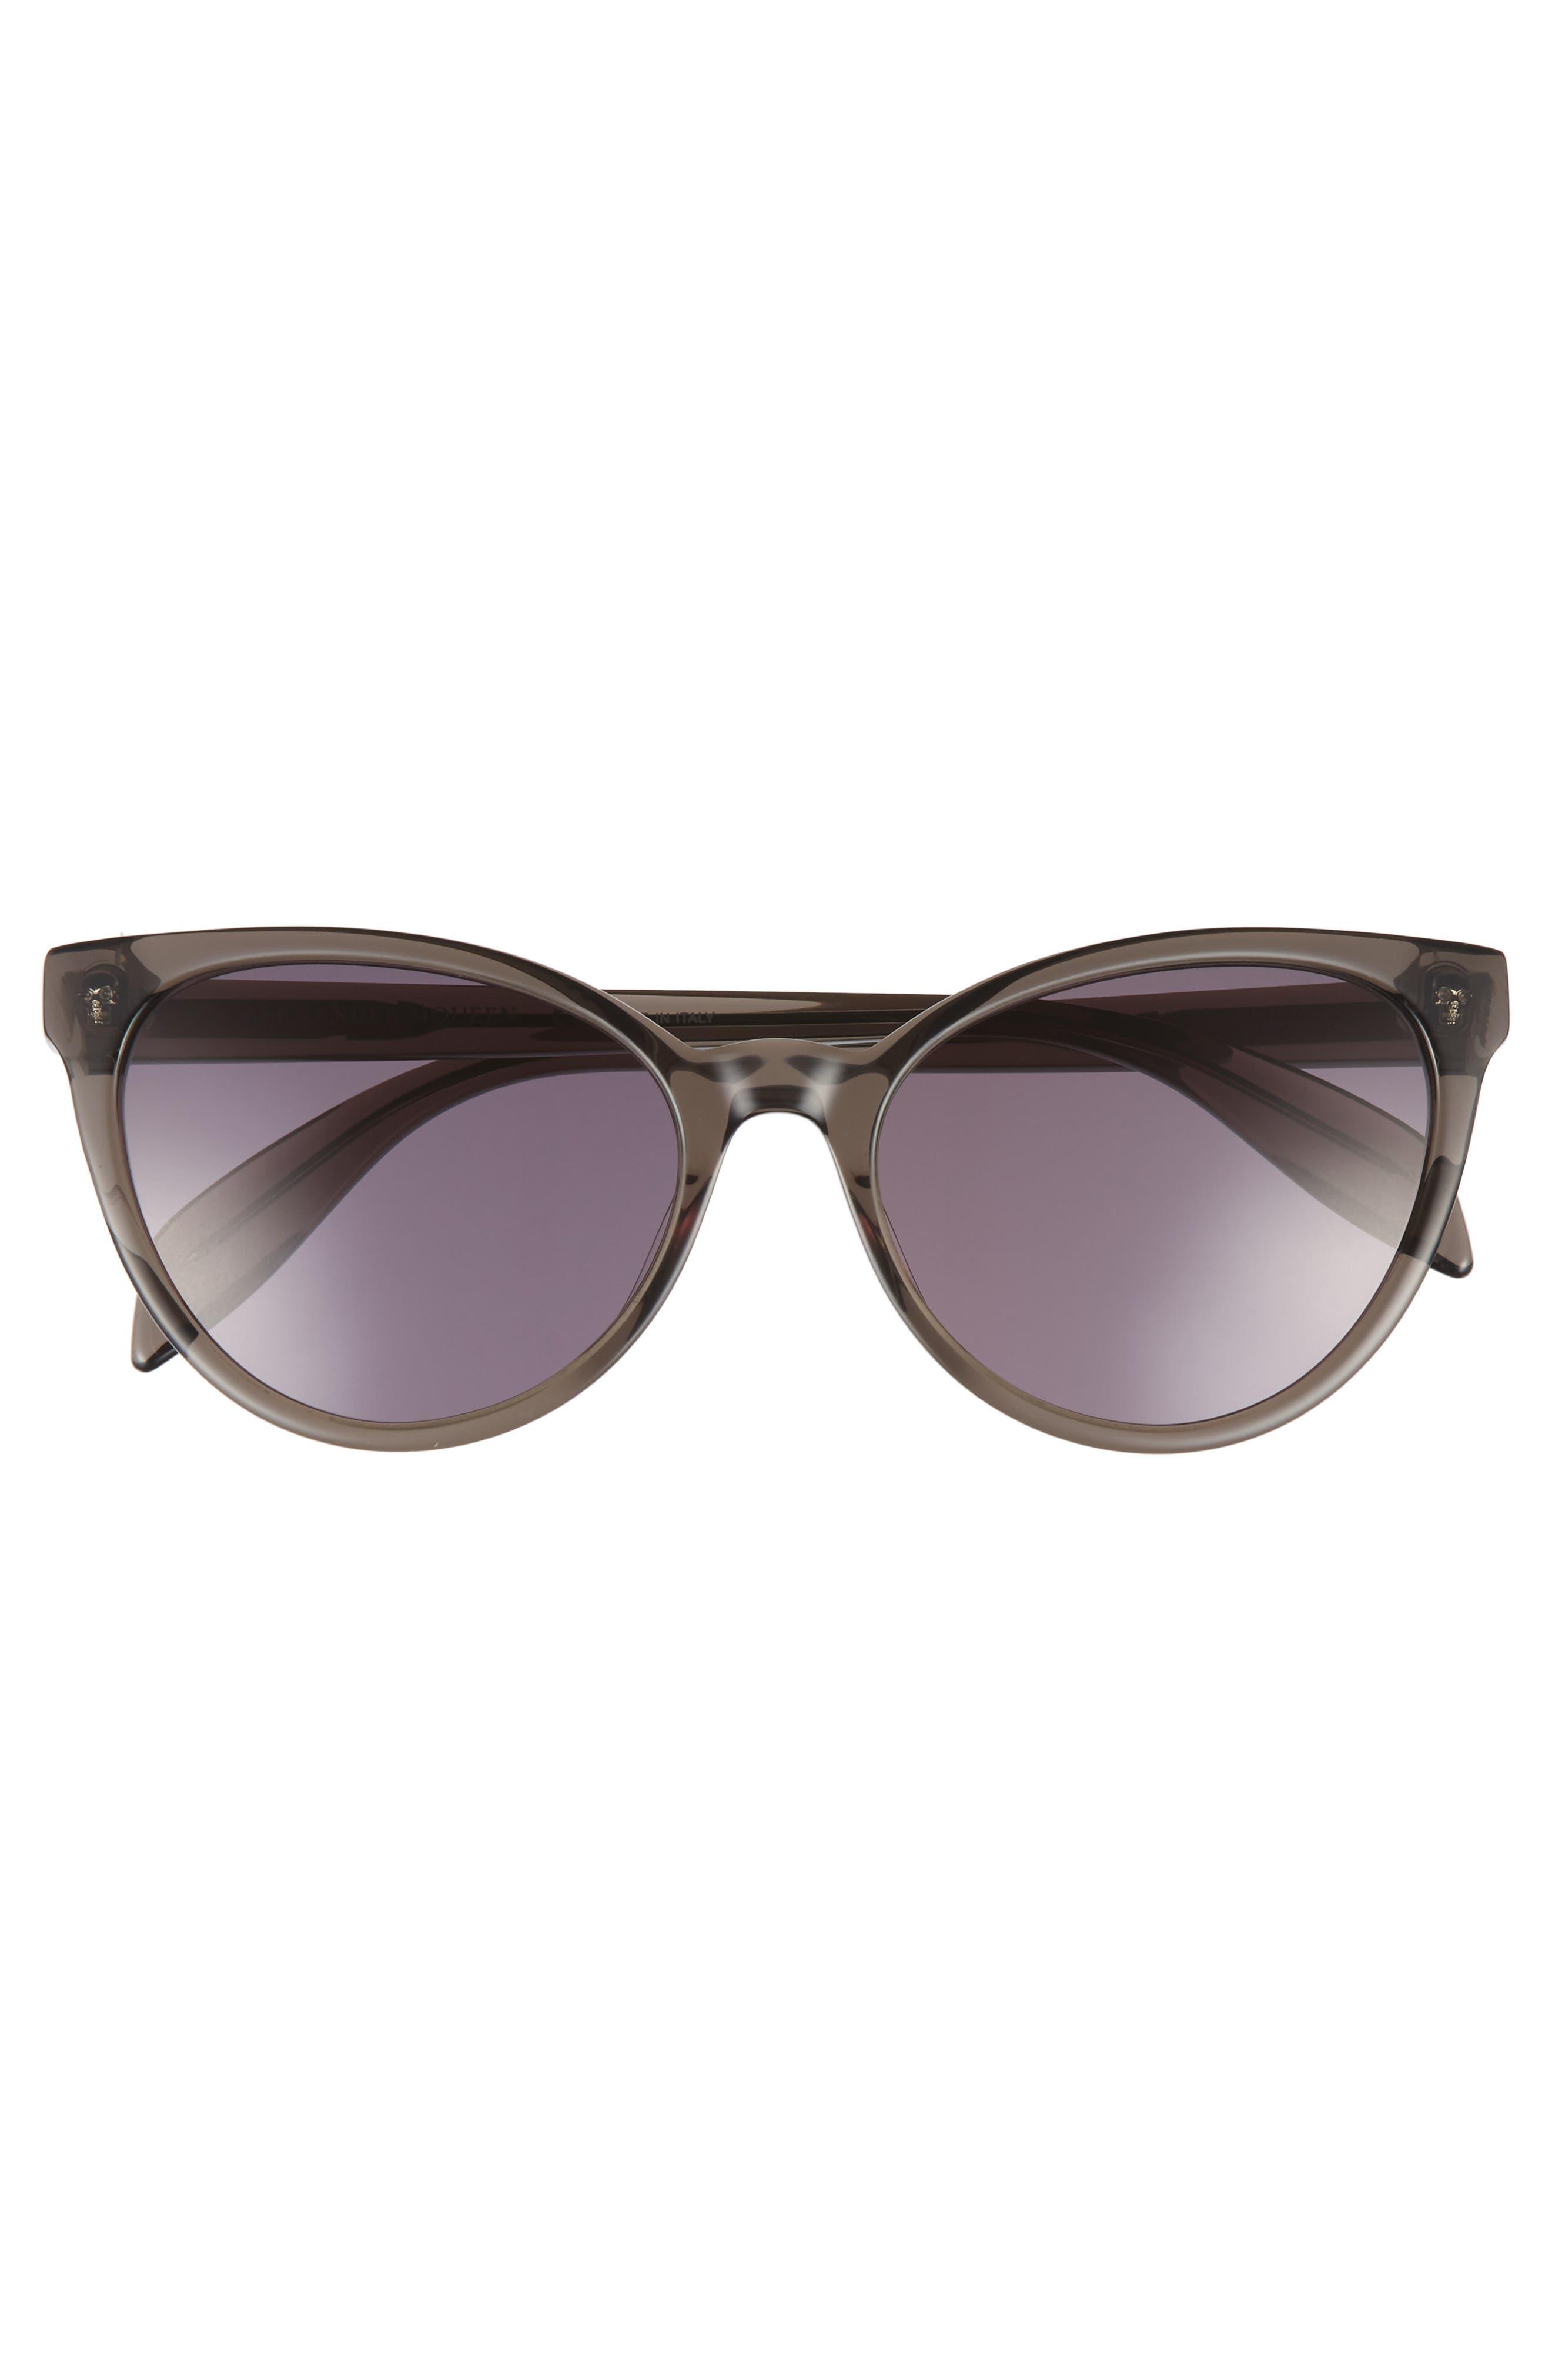 55mm Cat Eye Sunglasses,                             Alternate thumbnail 3, color,                             020